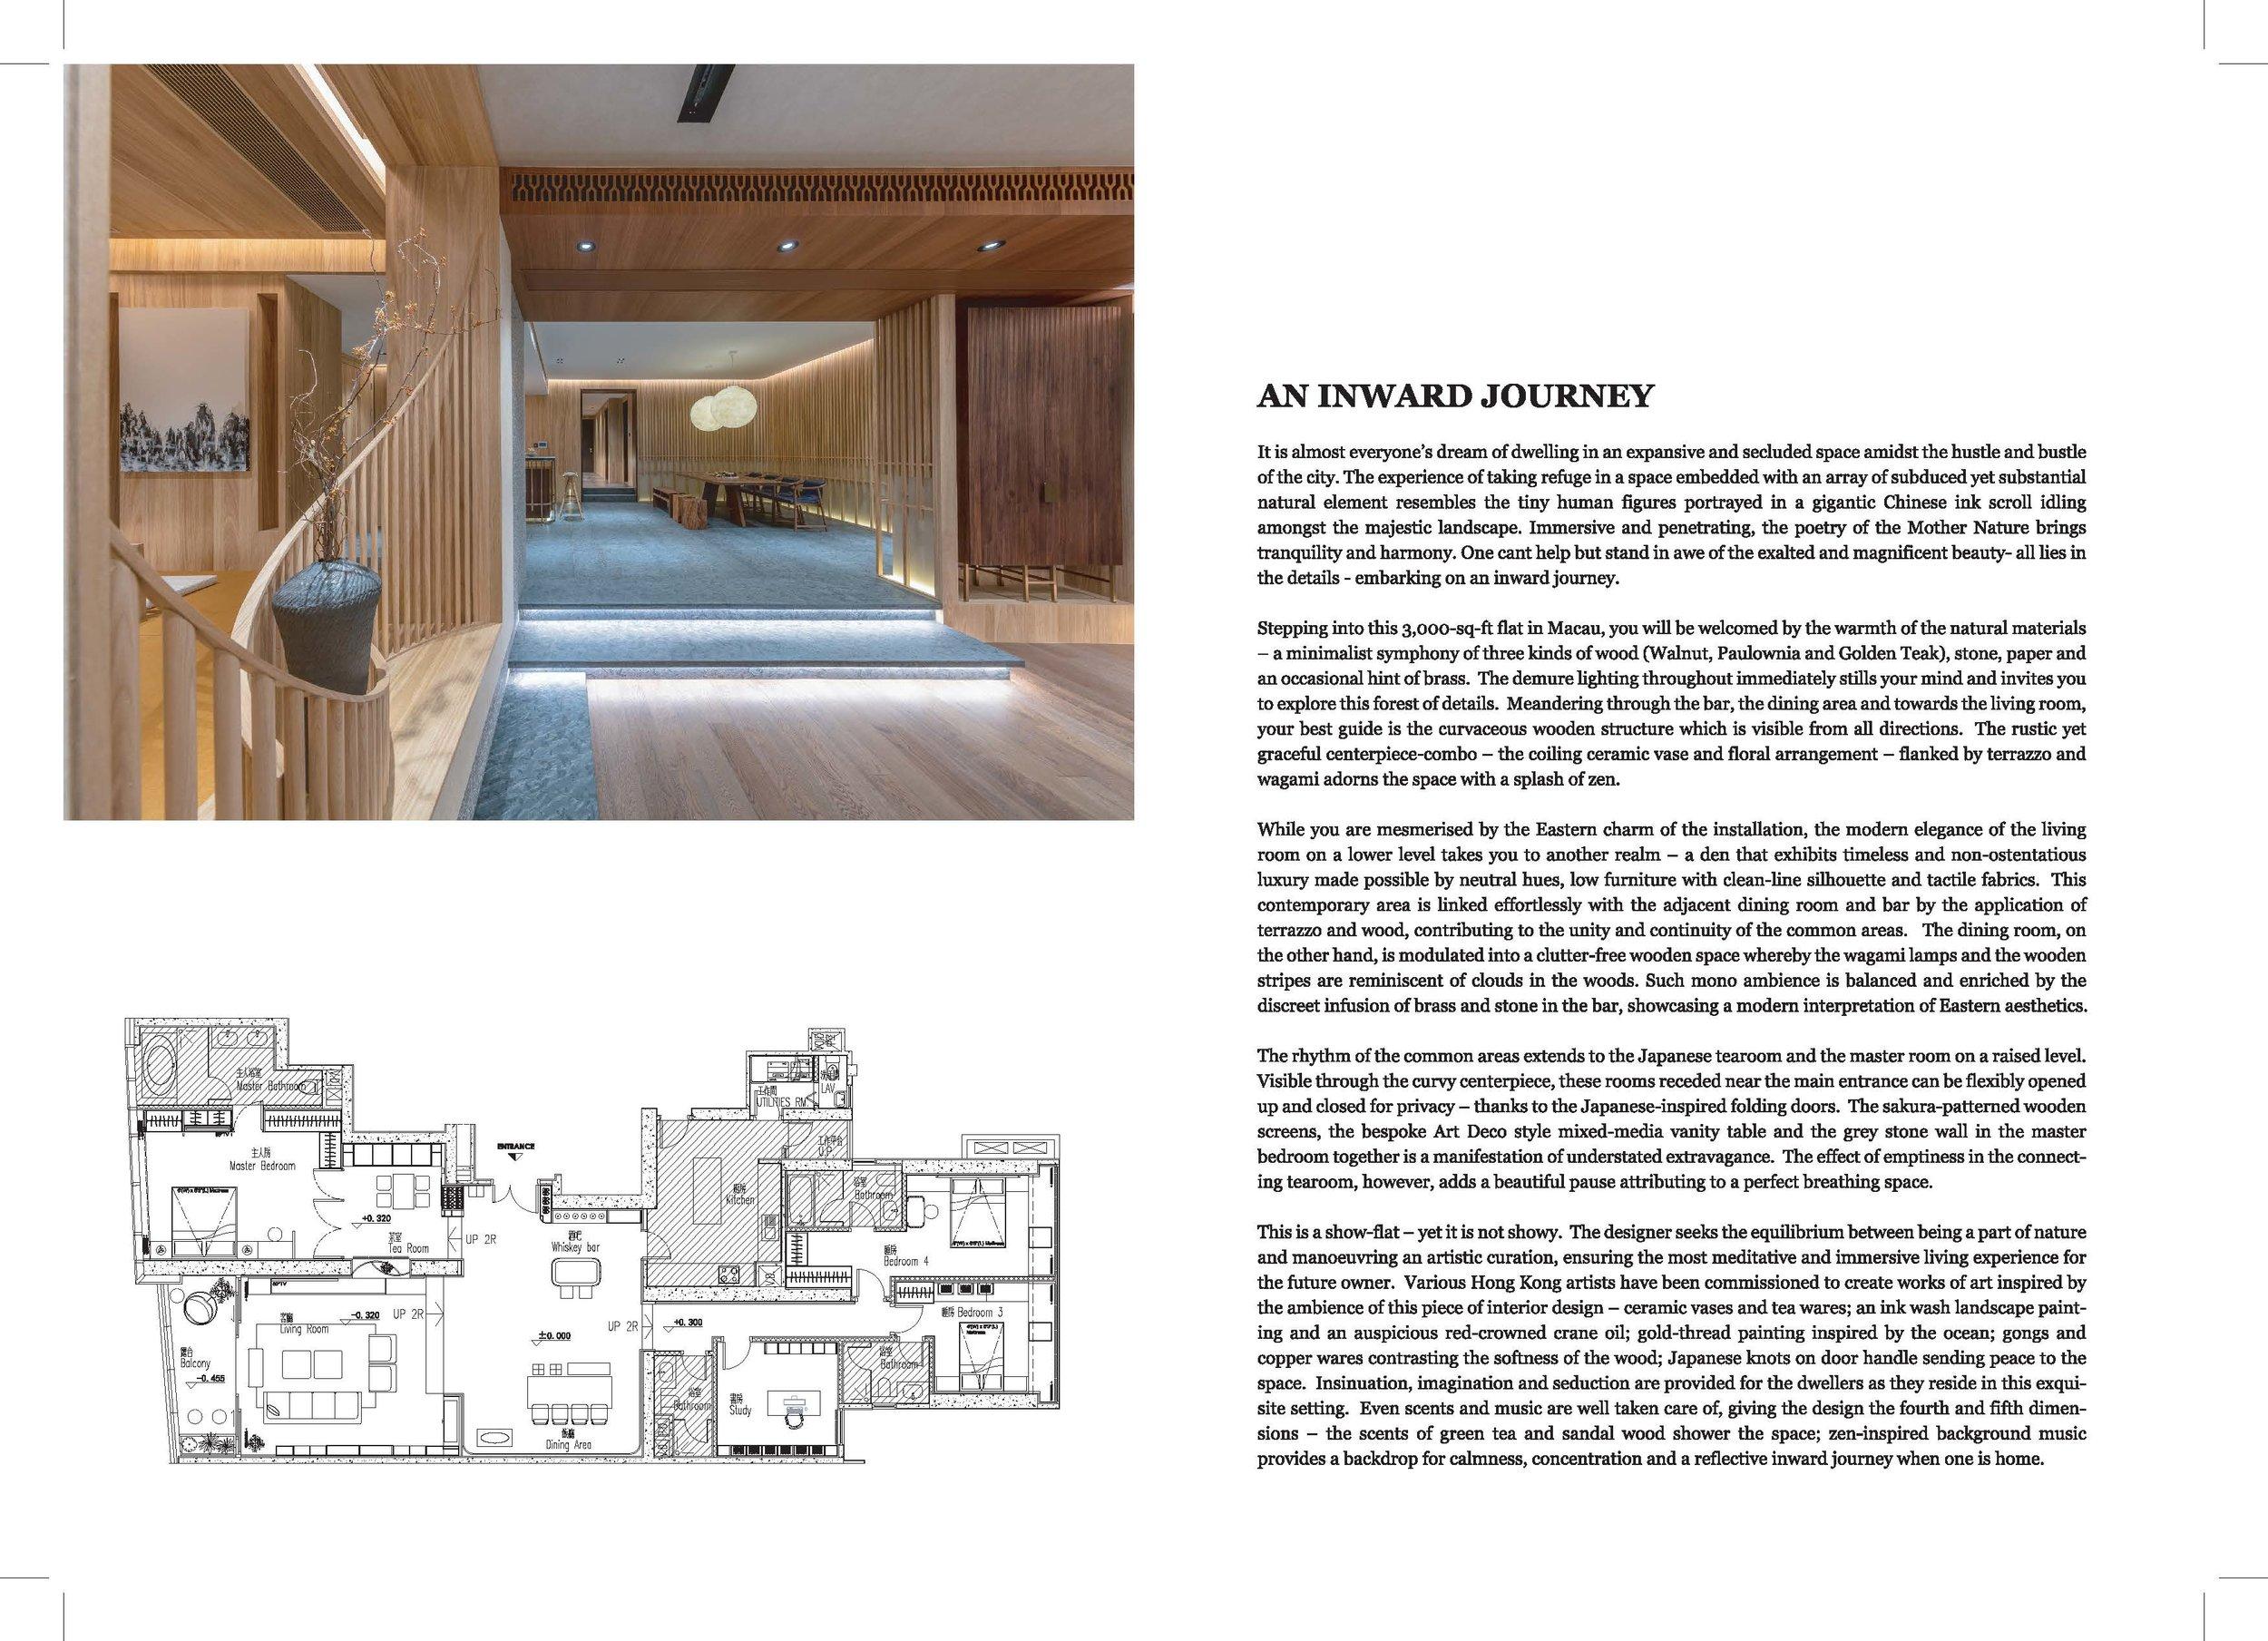 An Inward Journey - Design by: Max Lam DesignsInterior Division: ResidentialWebsite: https://maxlam.com